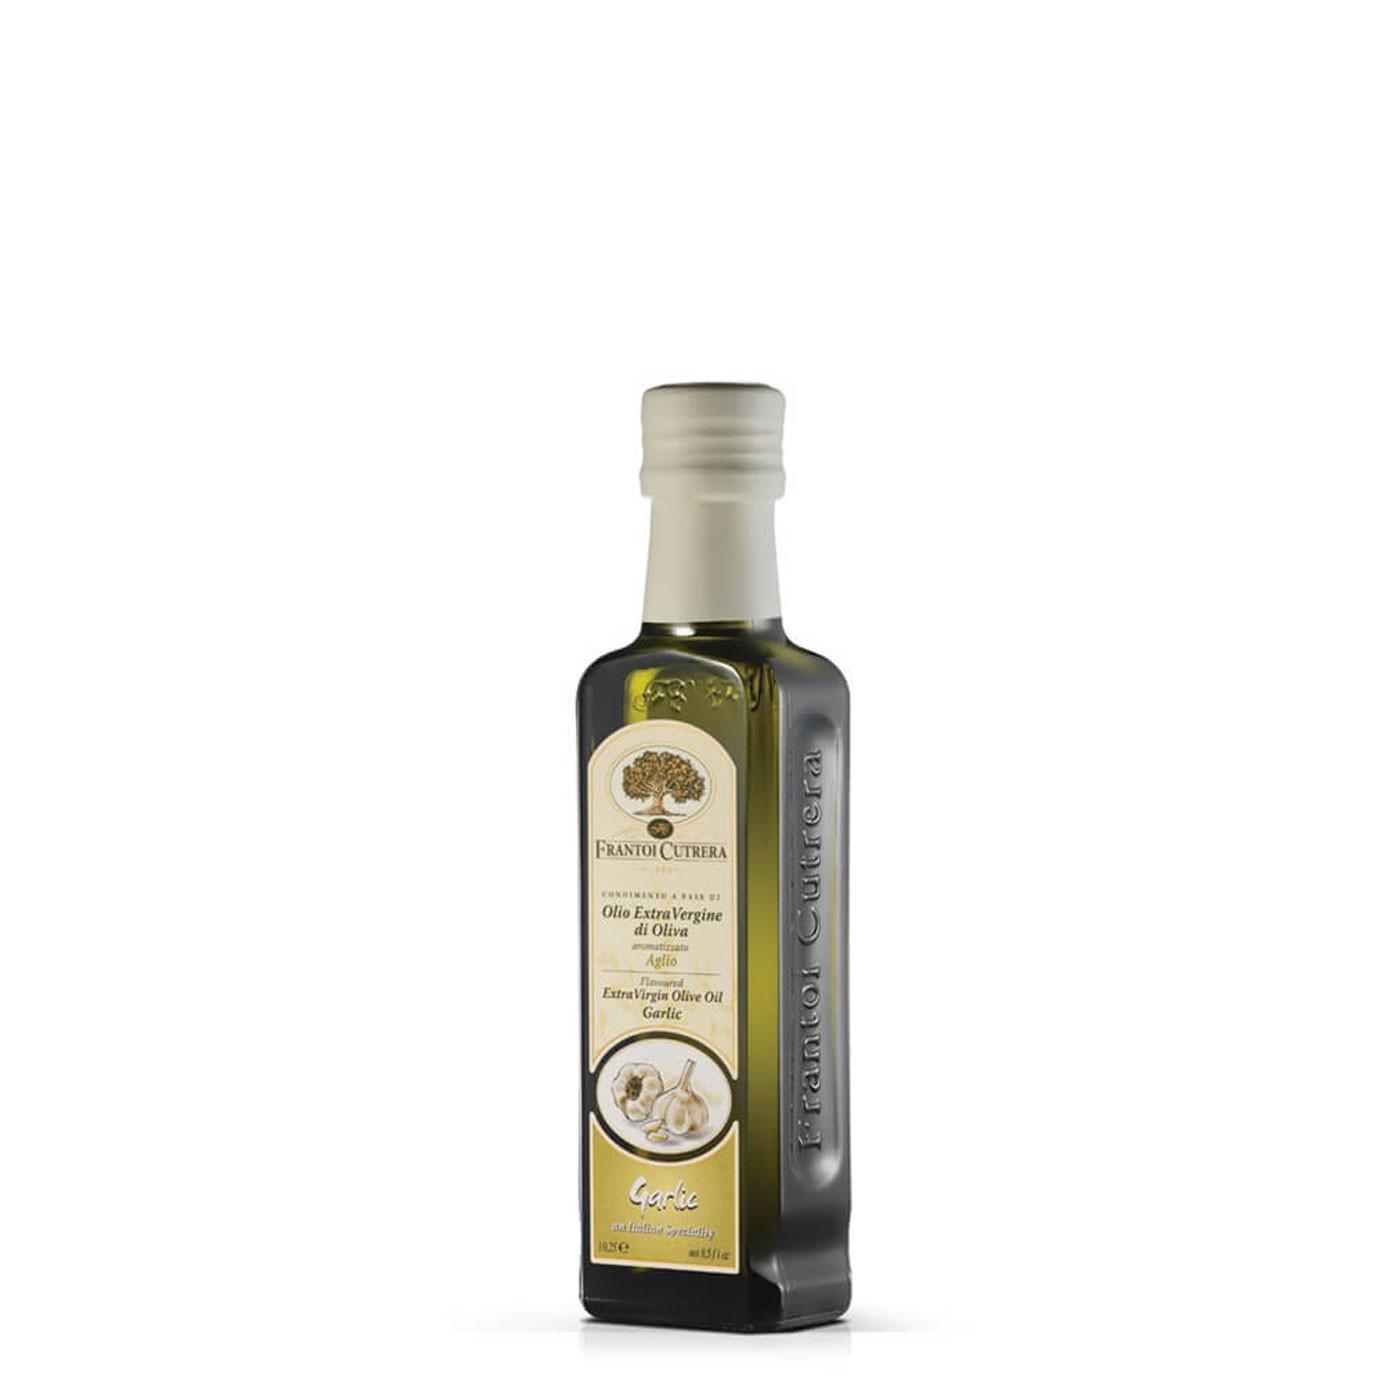 Garlic Infused Extra Virgin Olive Oil 8.45 oz